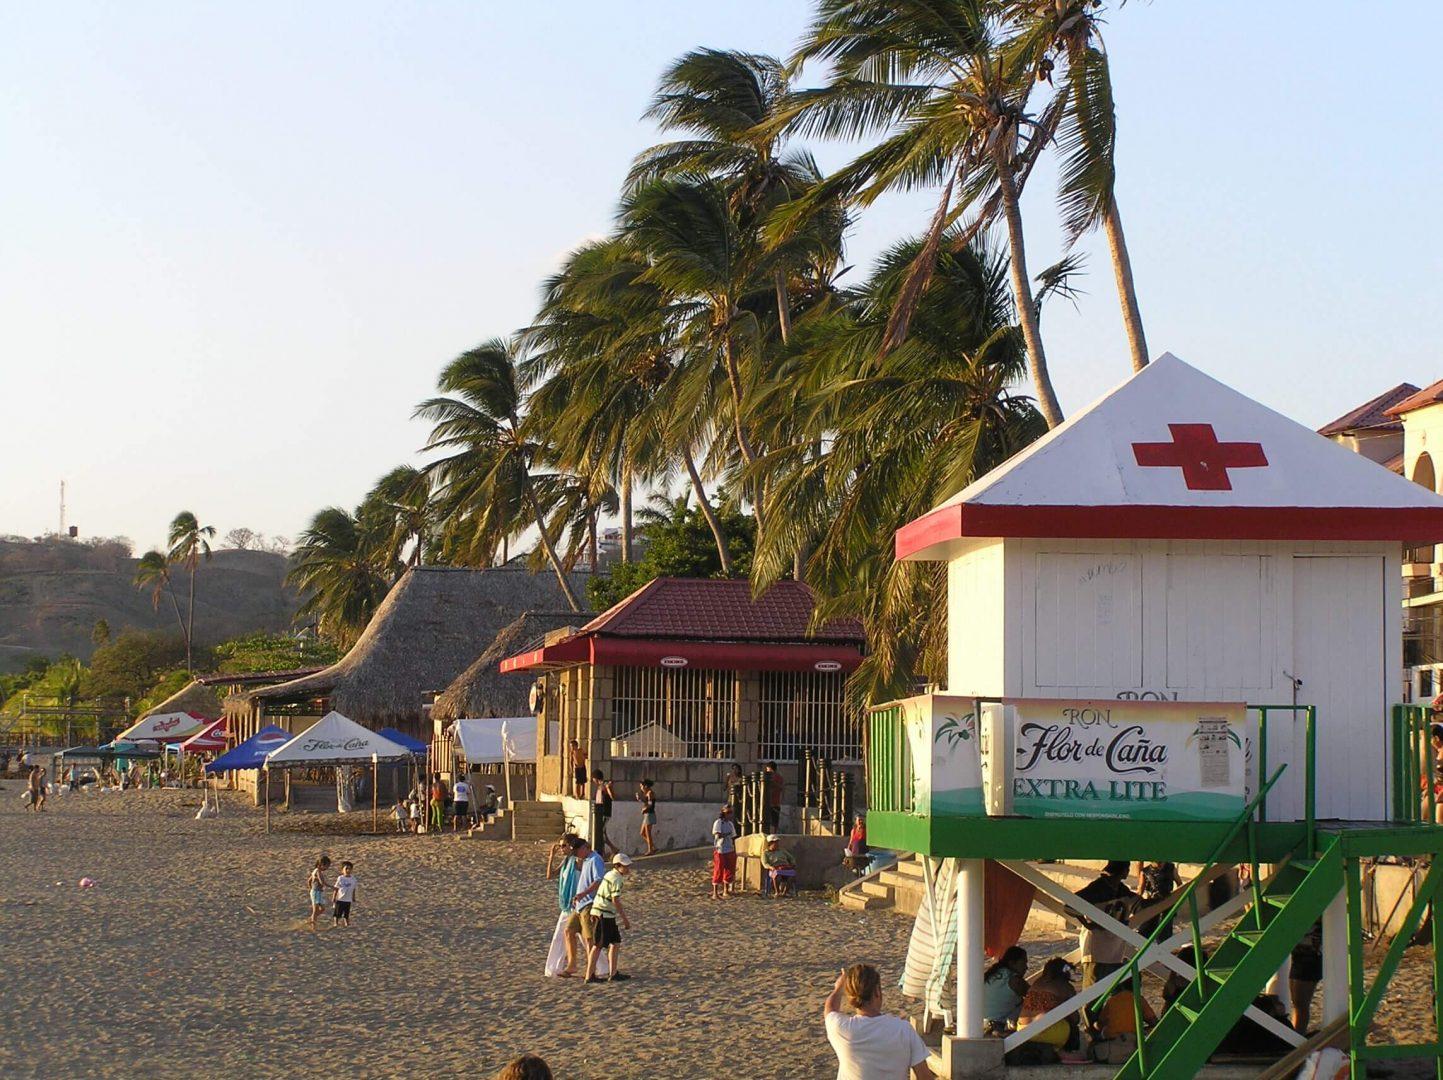 Nicaragua rest areas surf trip destination